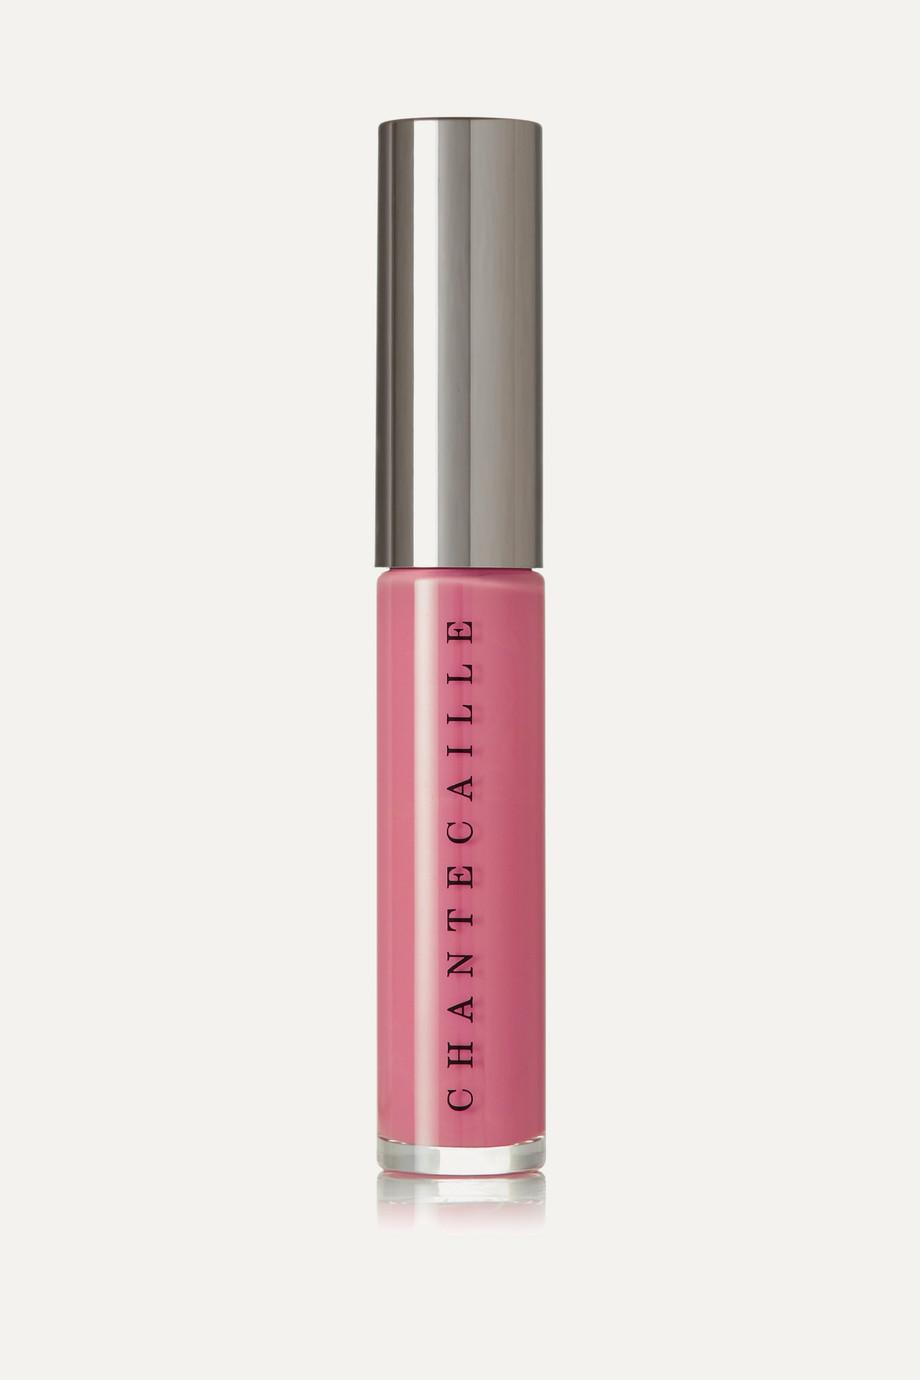 Chantecaille Matte Chic Liquid Lipstick - Jerry